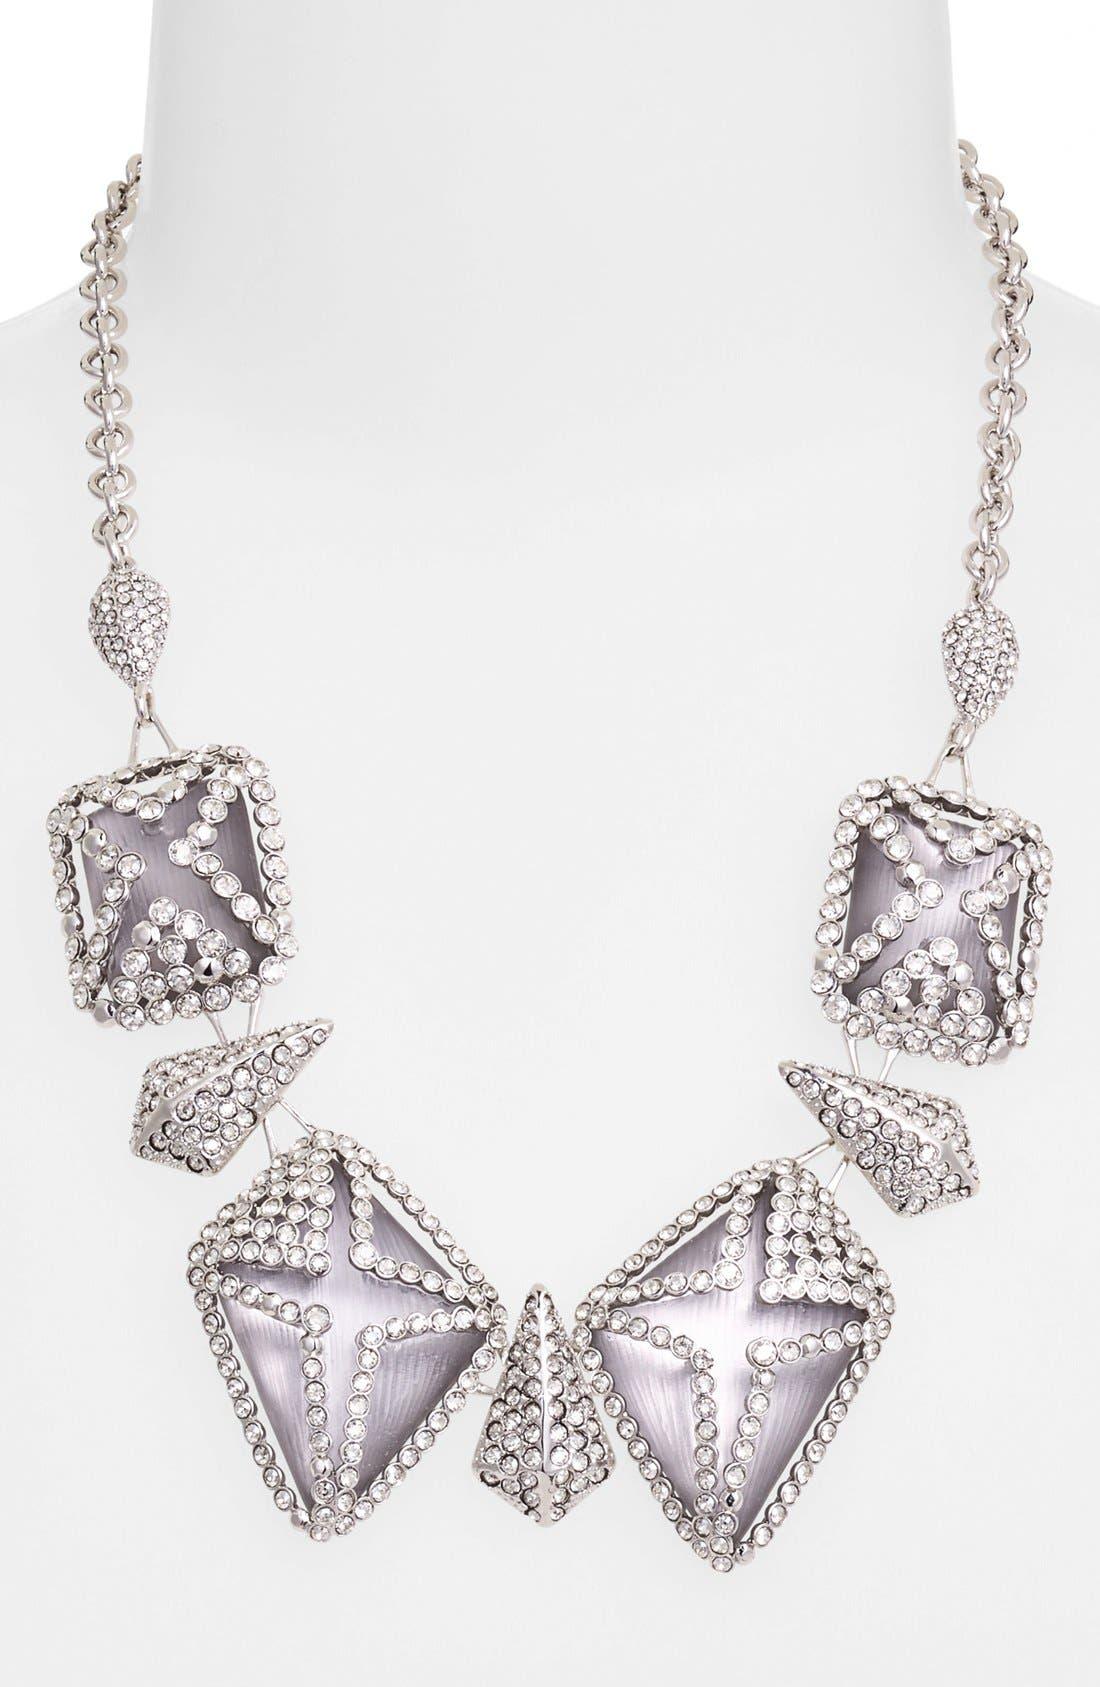 Main Image - Alexis Bittar 'Lucite® - Winter Deco' Bib Necklace